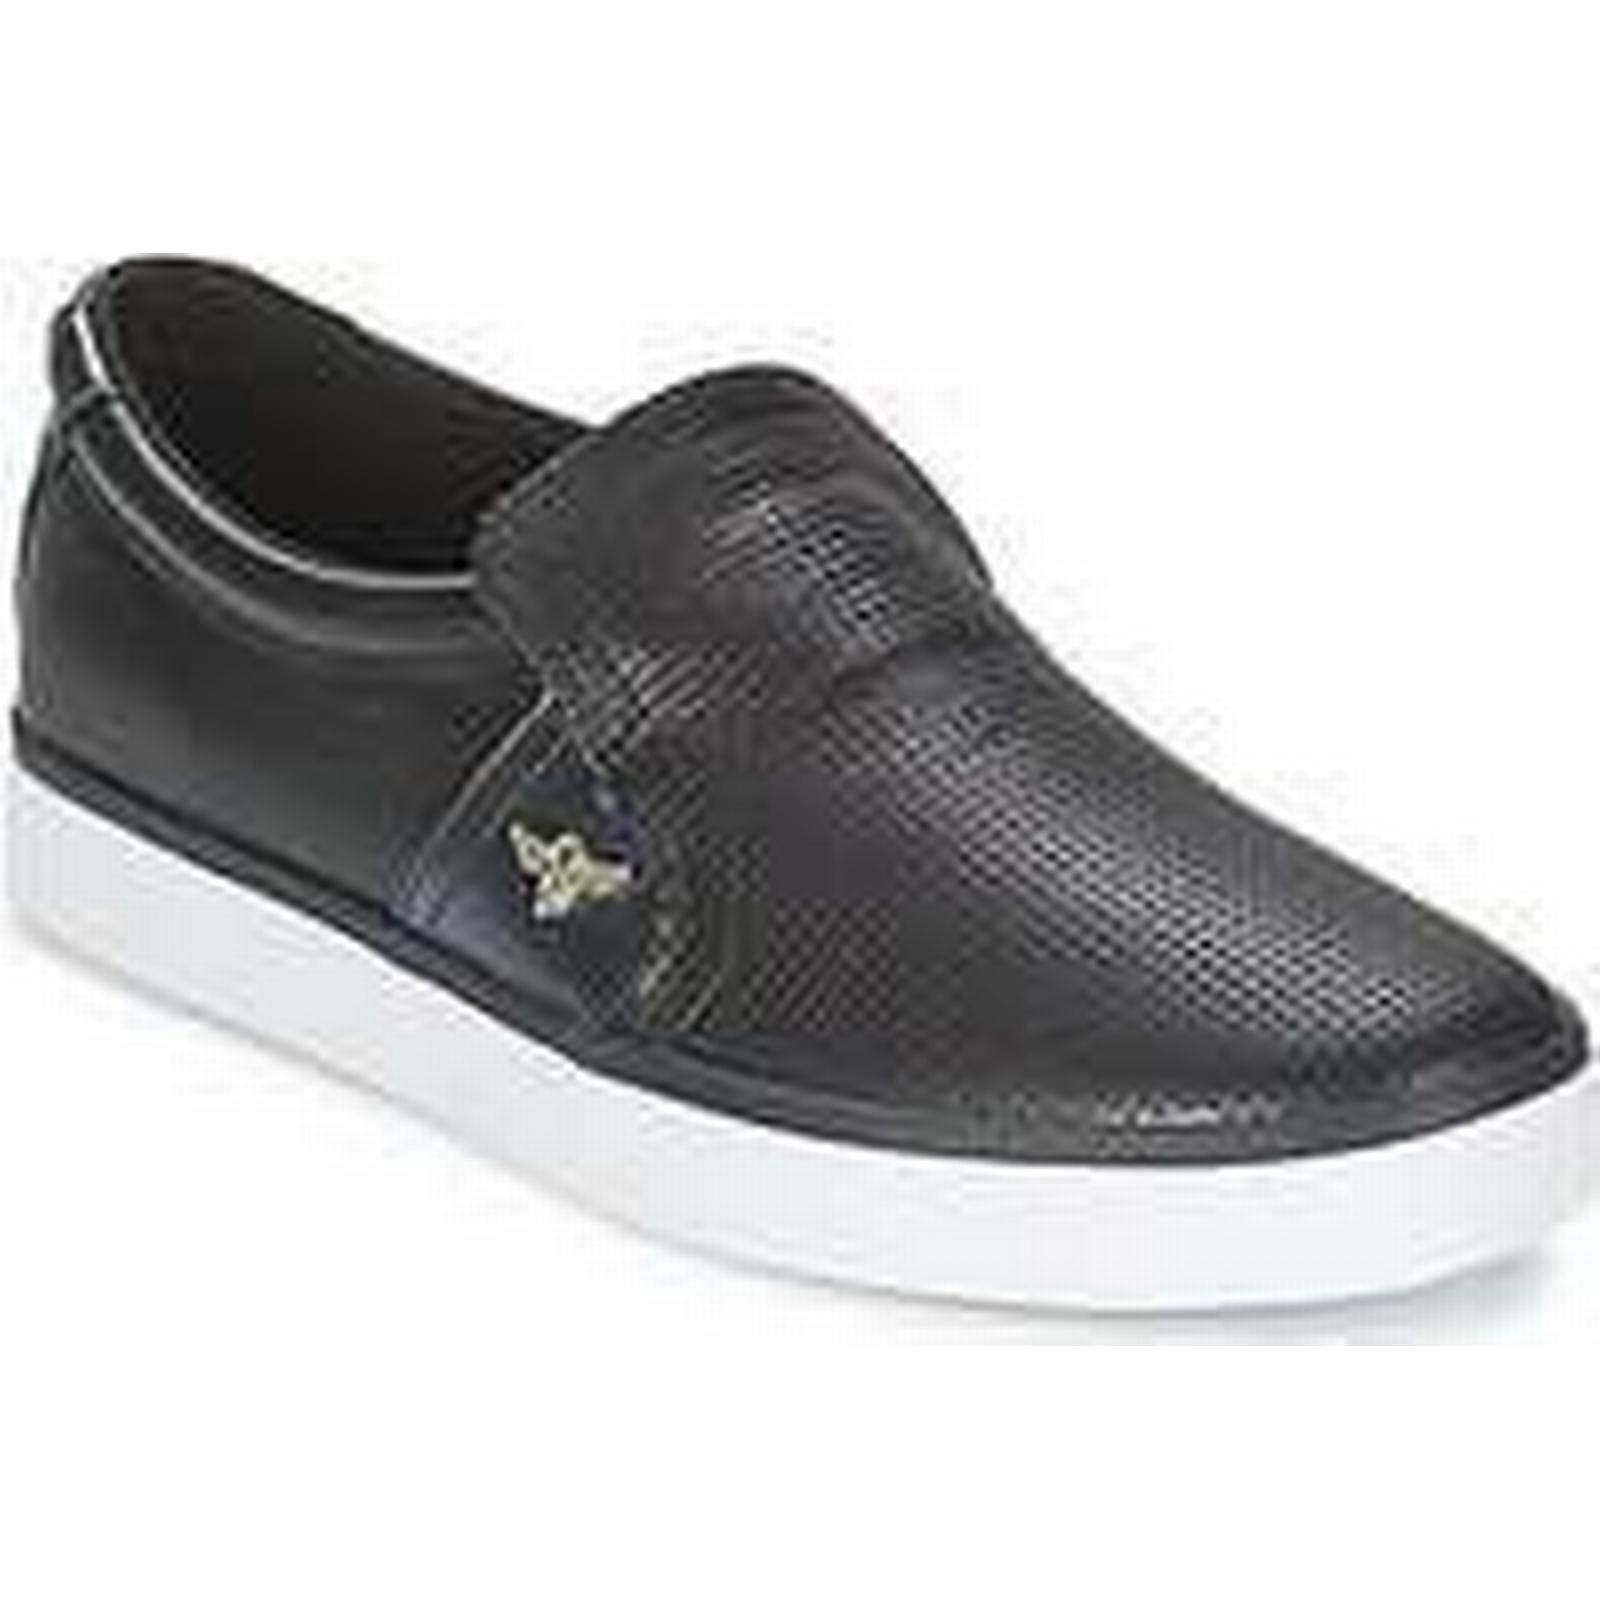 Spartoo.co.uk Creative Recreation VENTO in men's Slip-ons (Shoes) in VENTO Black e255e7